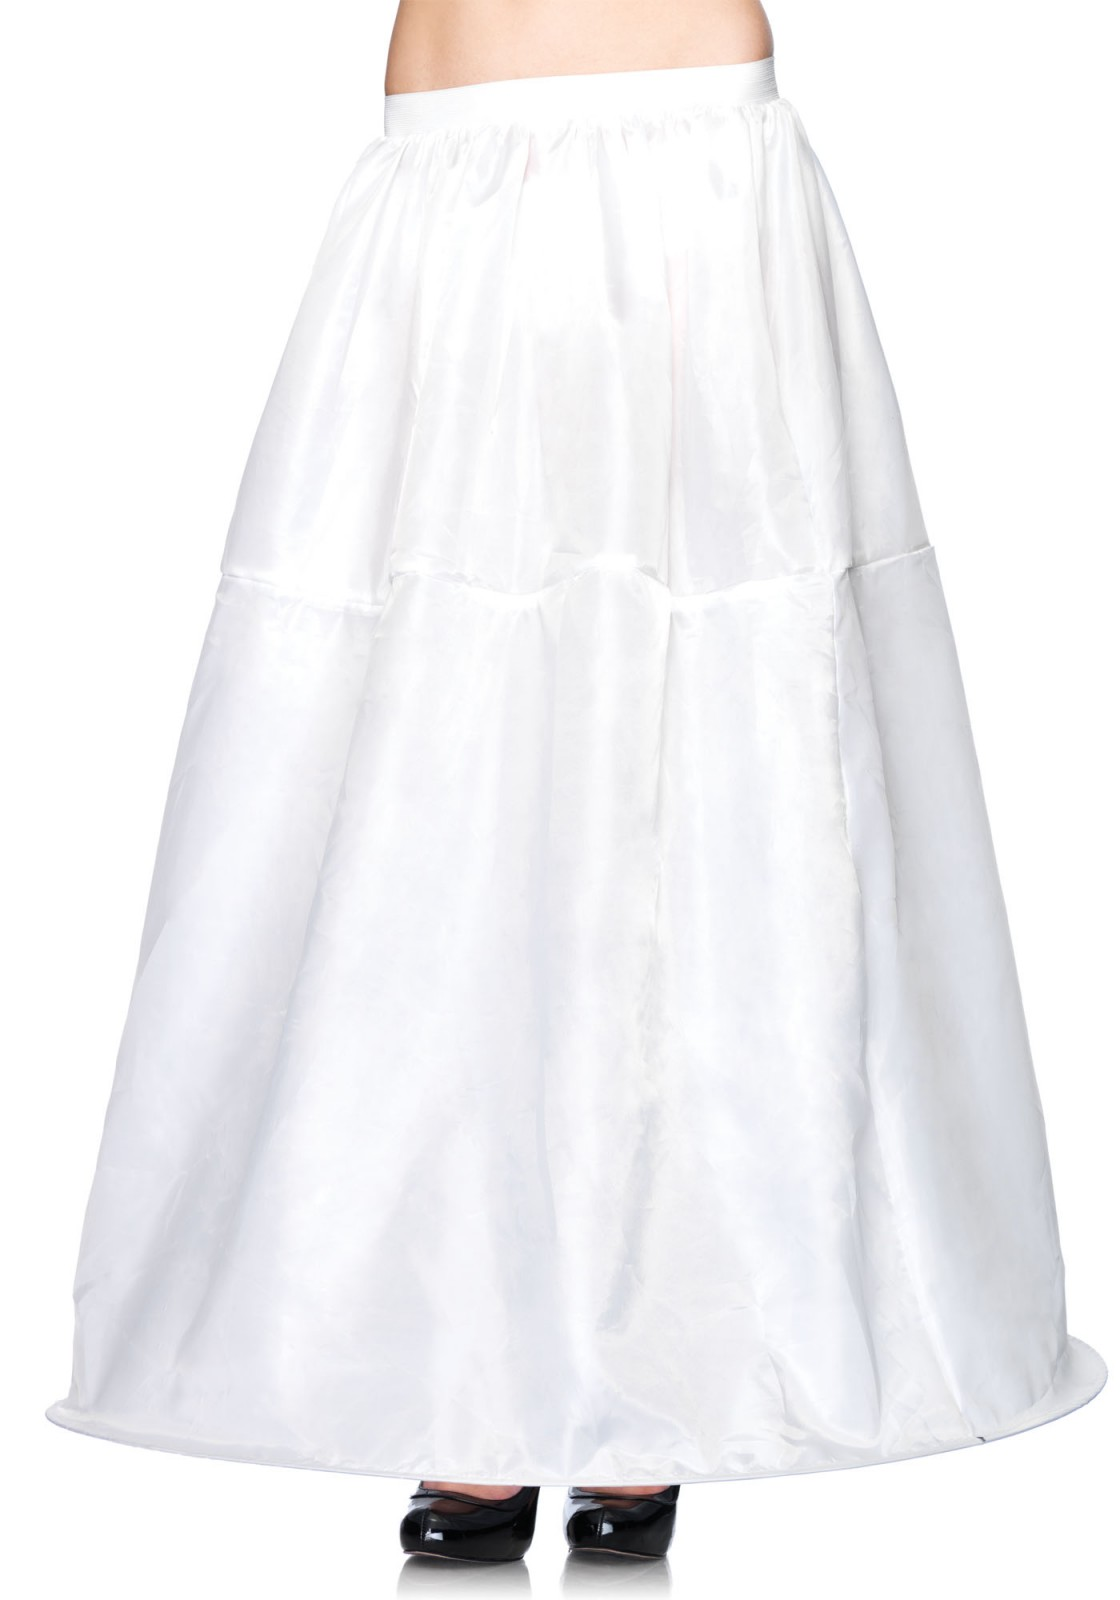 Long Hoop Skirt